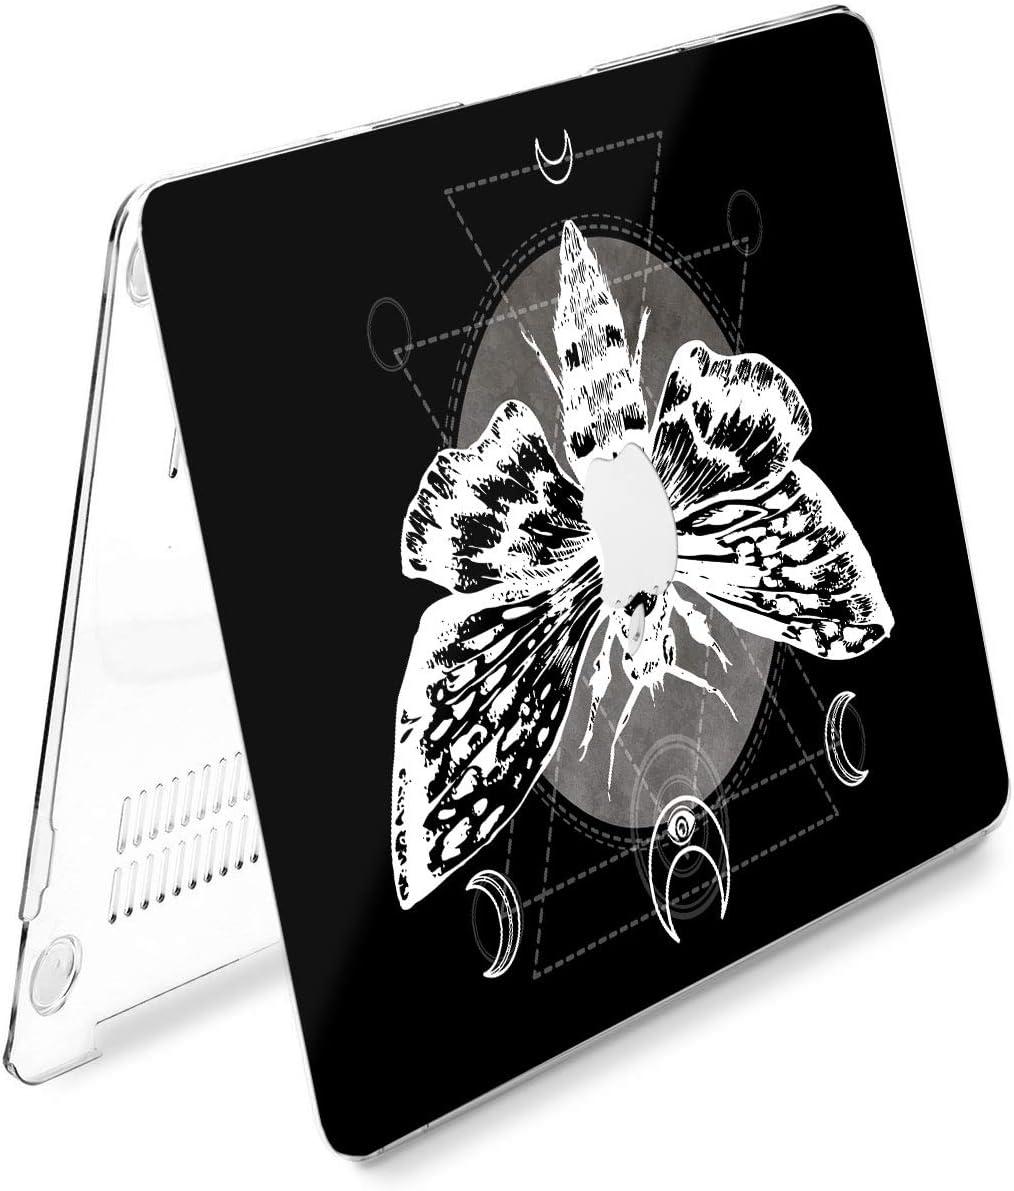 Lex Altern Hard Case for Apple MacBook Pro 15 Air 13 inch Mac Retina 12 11 2020 2019 2018 2017 2016 Cute Tropical Gentle Protective White Llama Laptop Print Touch Bar Cactus Nature Shell Design